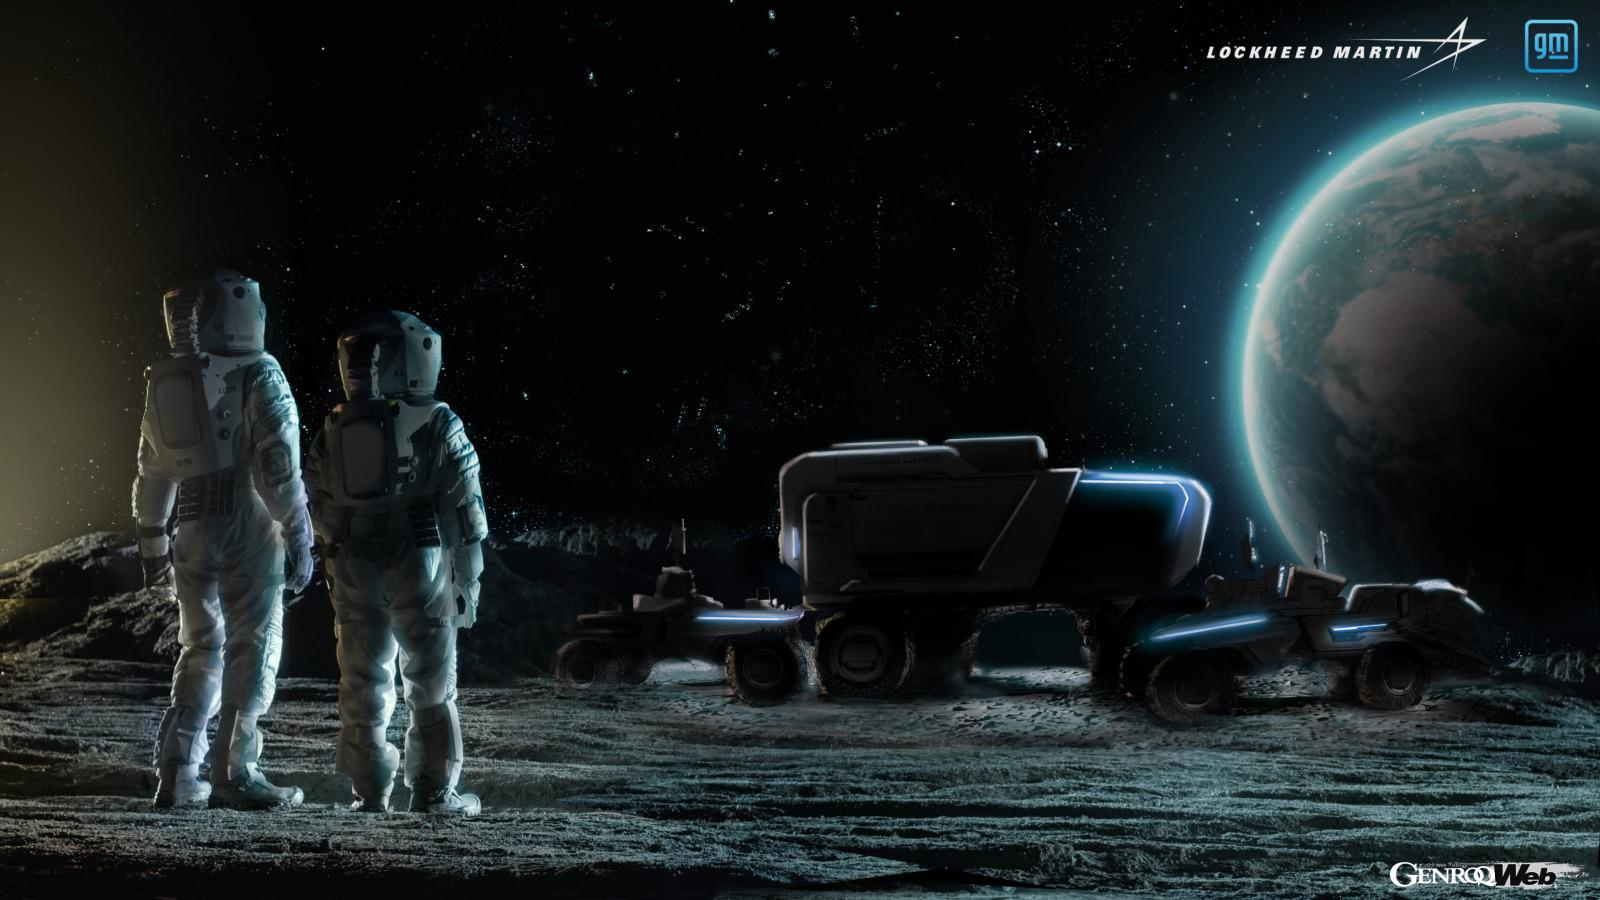 GMが次世代月面探査車を開発! アルテミス計画に用いる「21世紀のムーン・バギー」は自動運転車に 【動画】